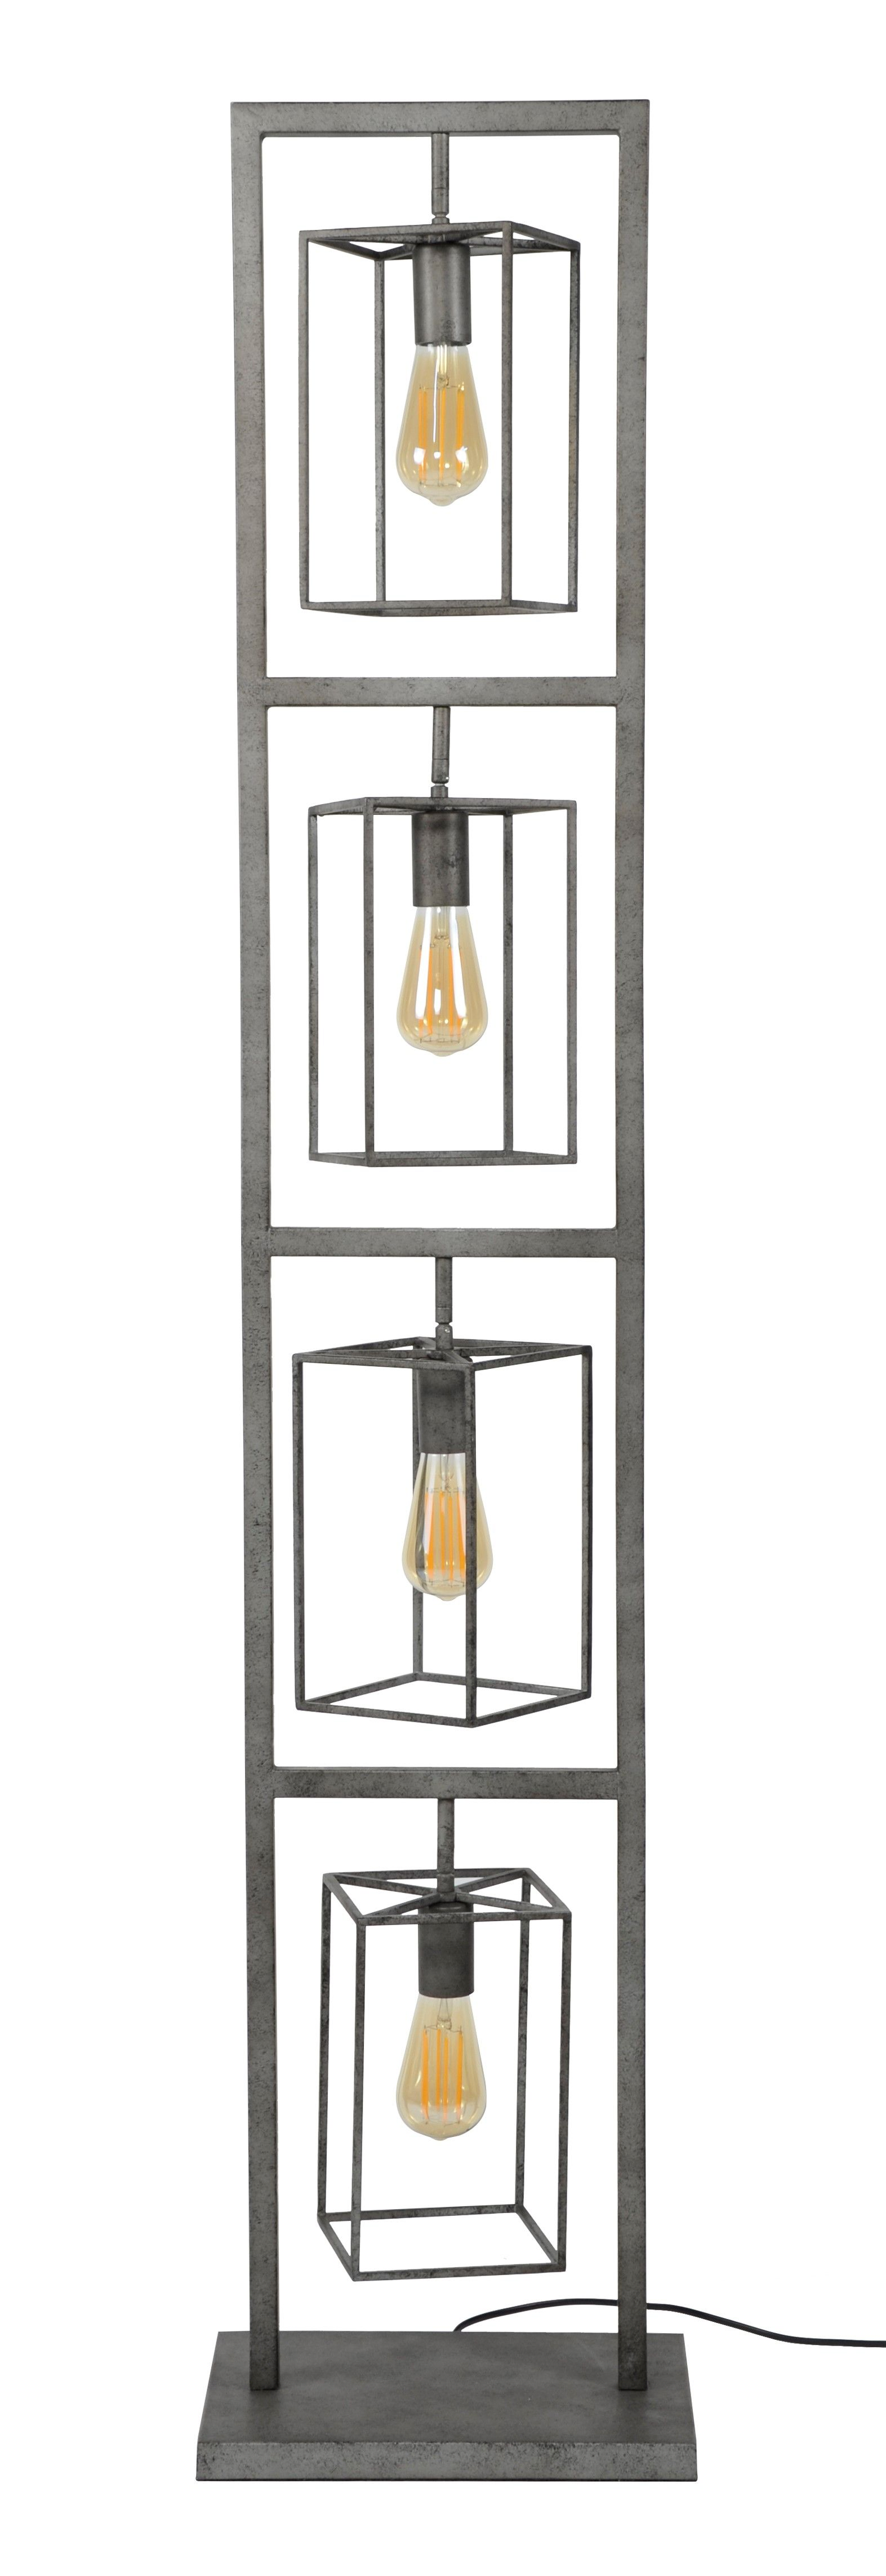 Stehlampe Kube Stehlampe Lampe Lampen